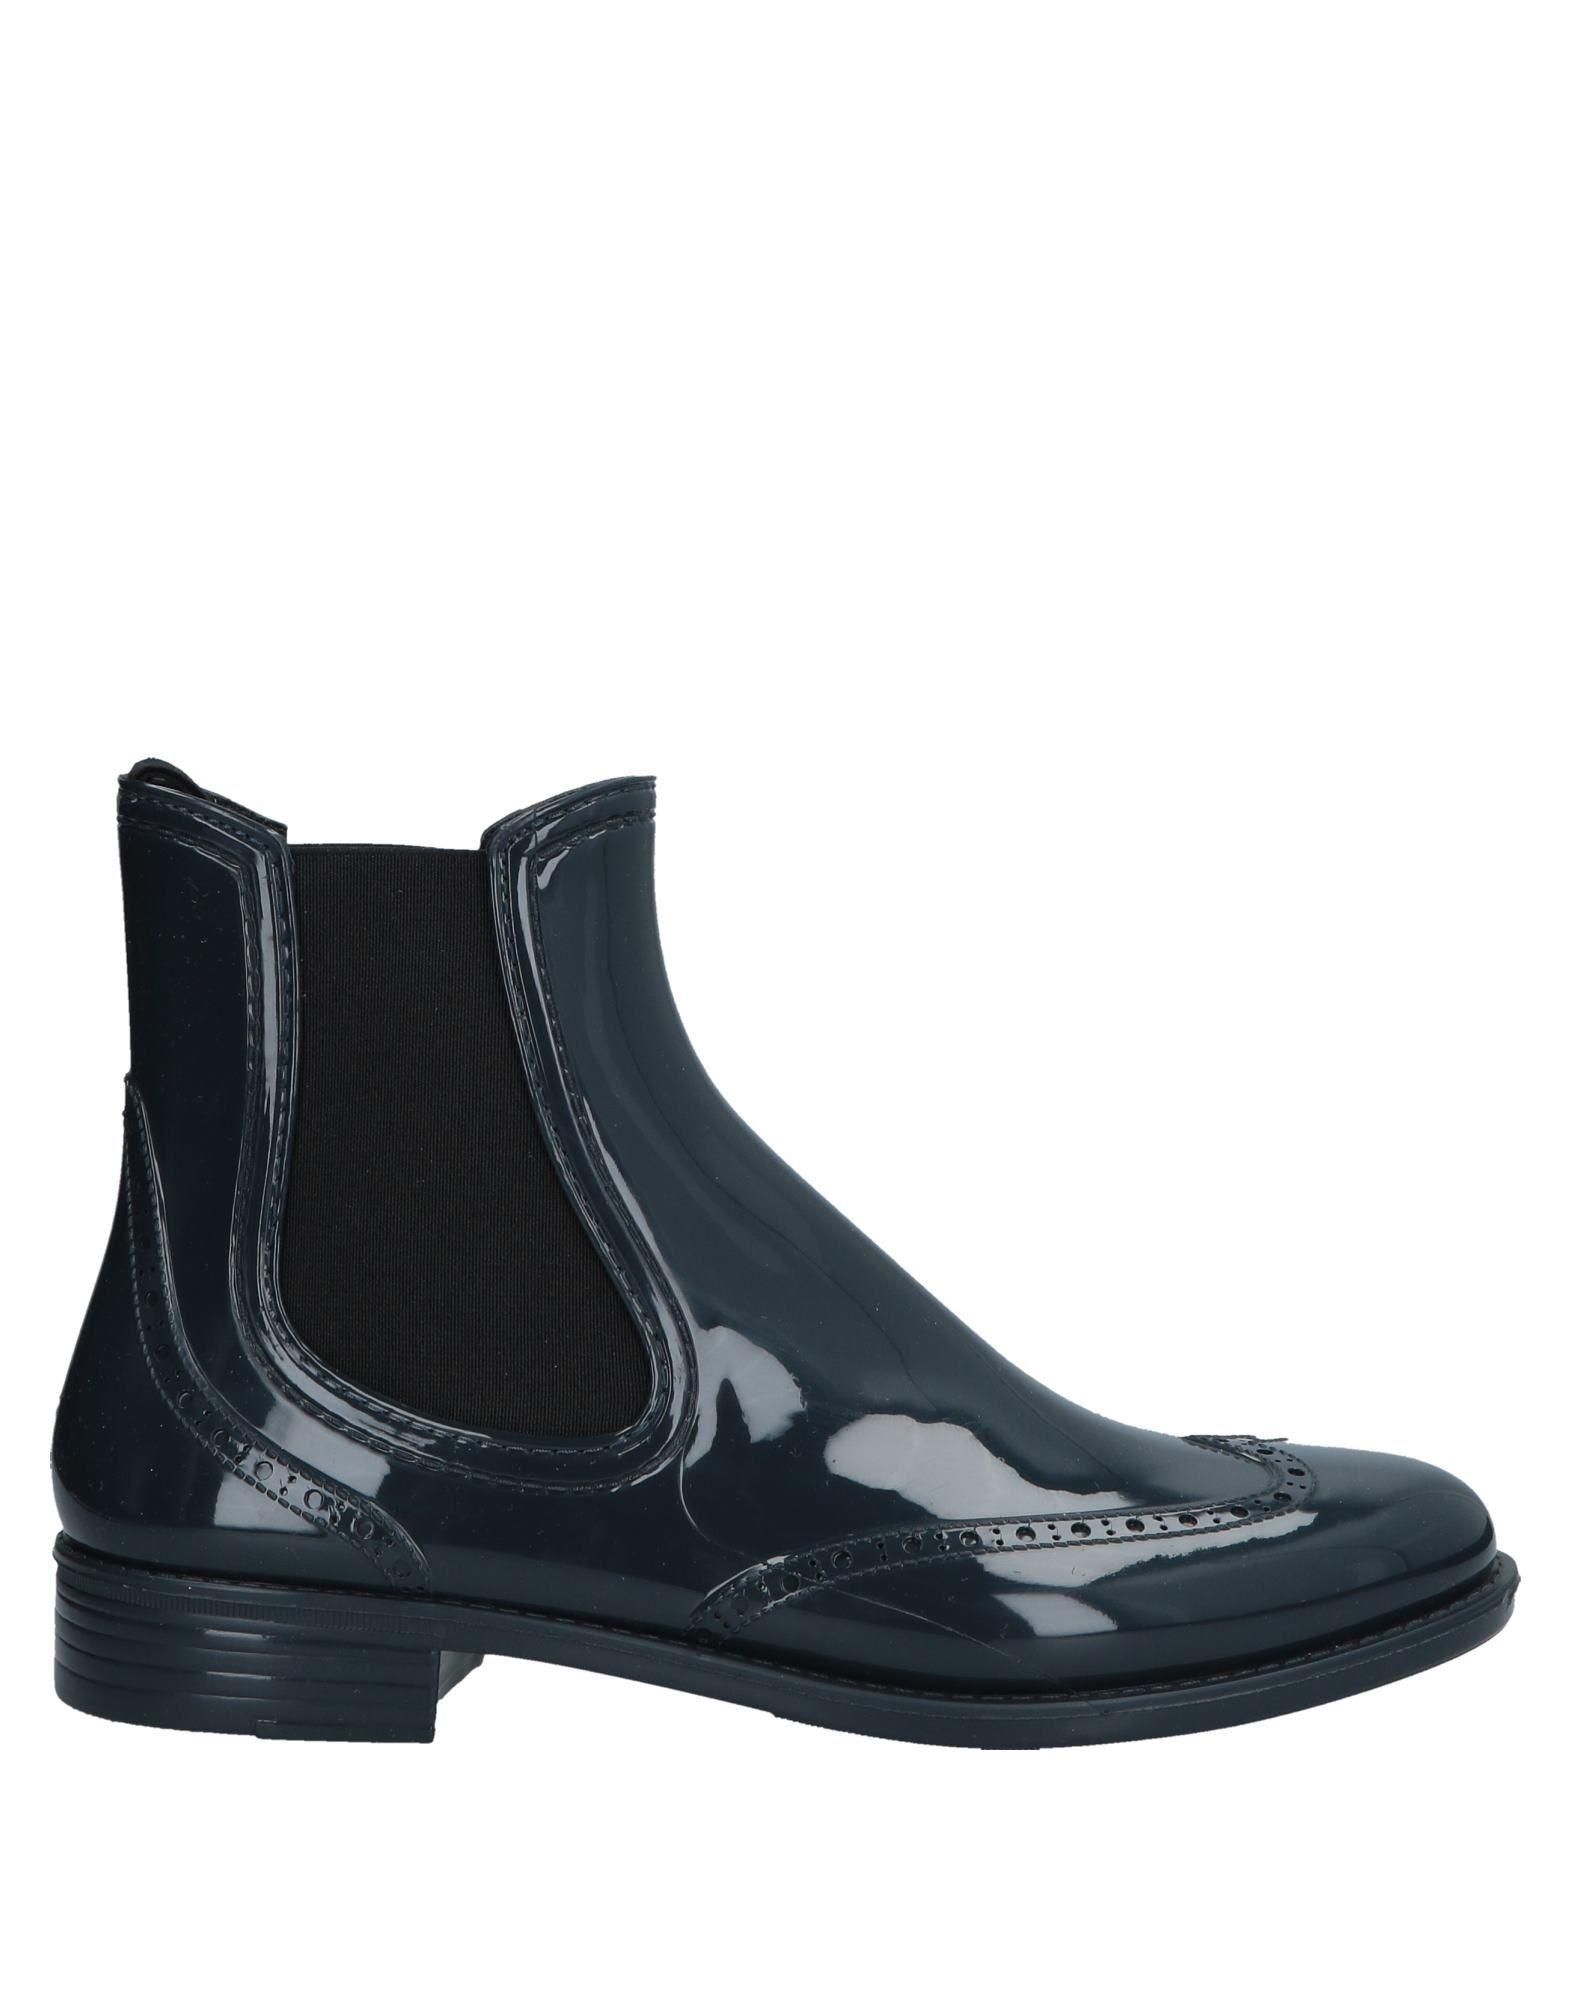 Liviana Conti Stiefelette Damen  11030984PE Gute Qualität beliebte Schuhe